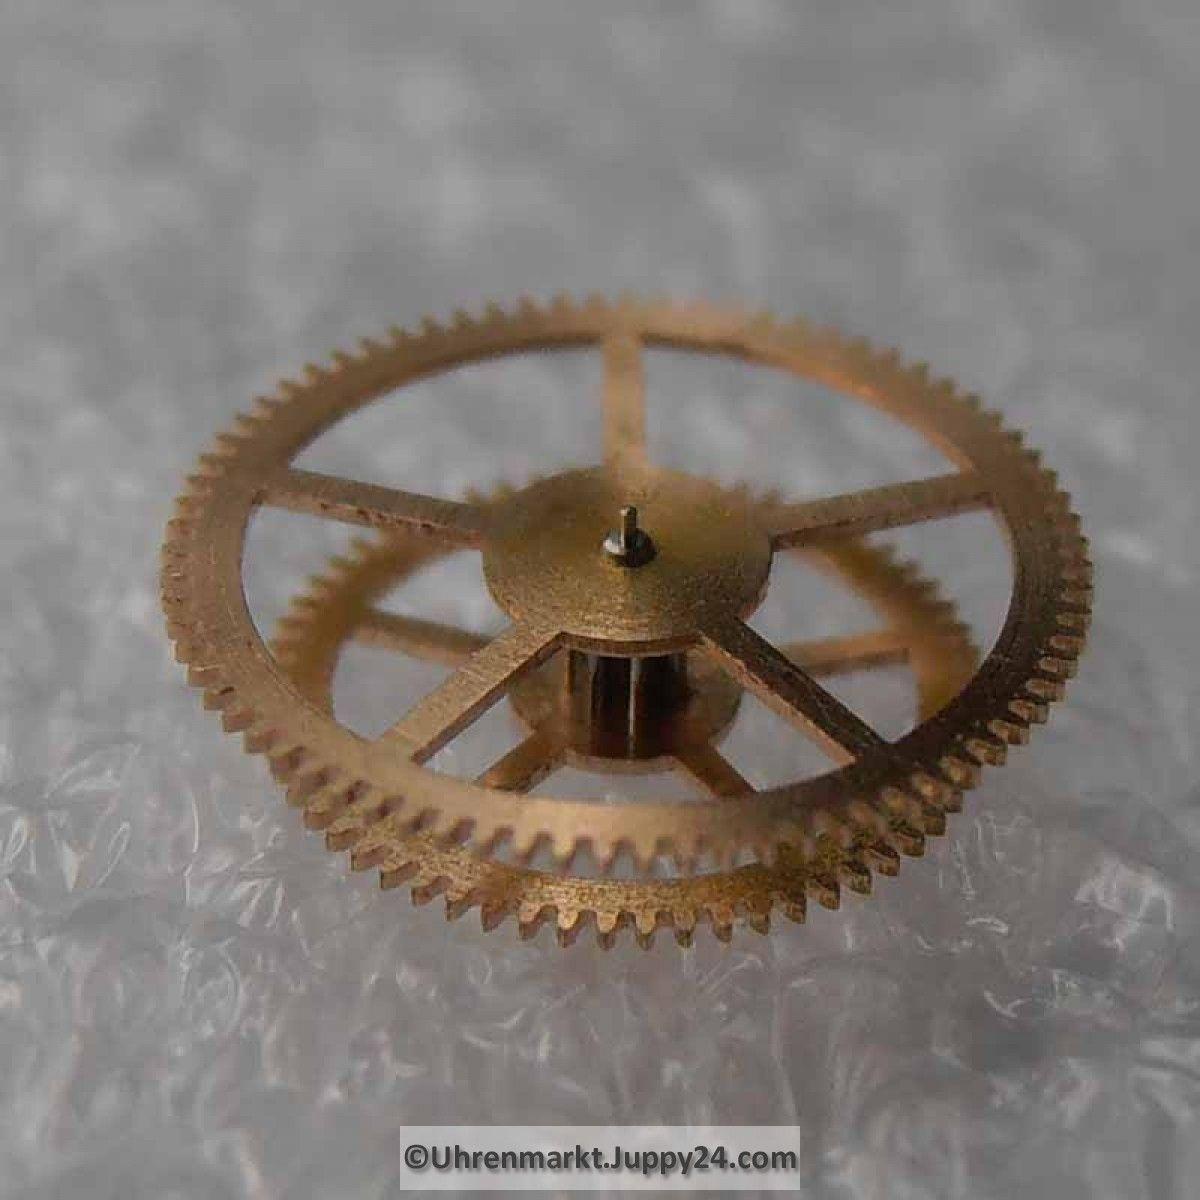 Omega Kleinbodenrad Part Nr.1240 Cal. 470 471 490 491 500 501 502 503